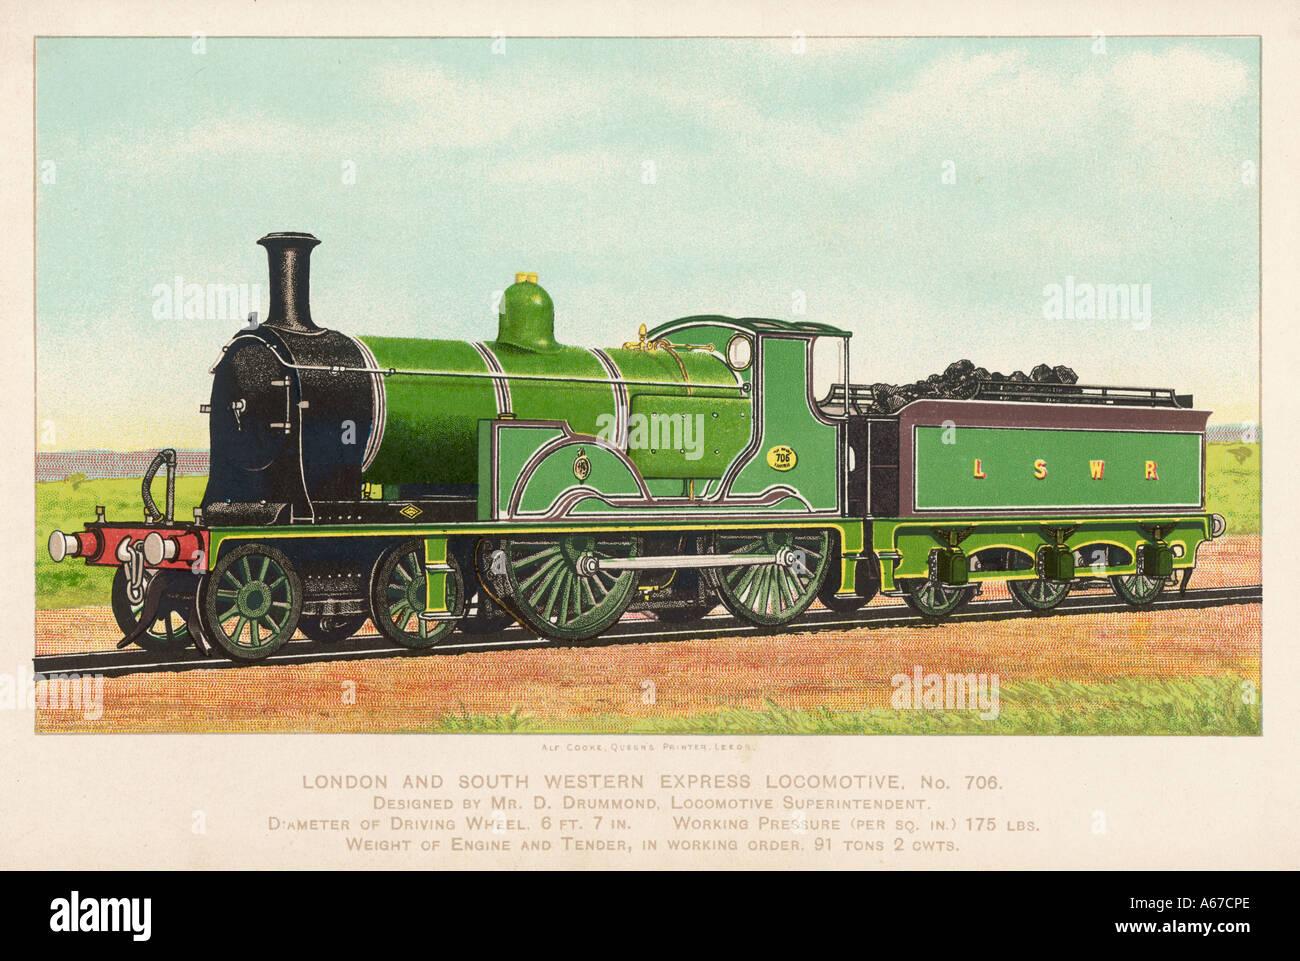 London And Swr Loco 706 - Stock Image